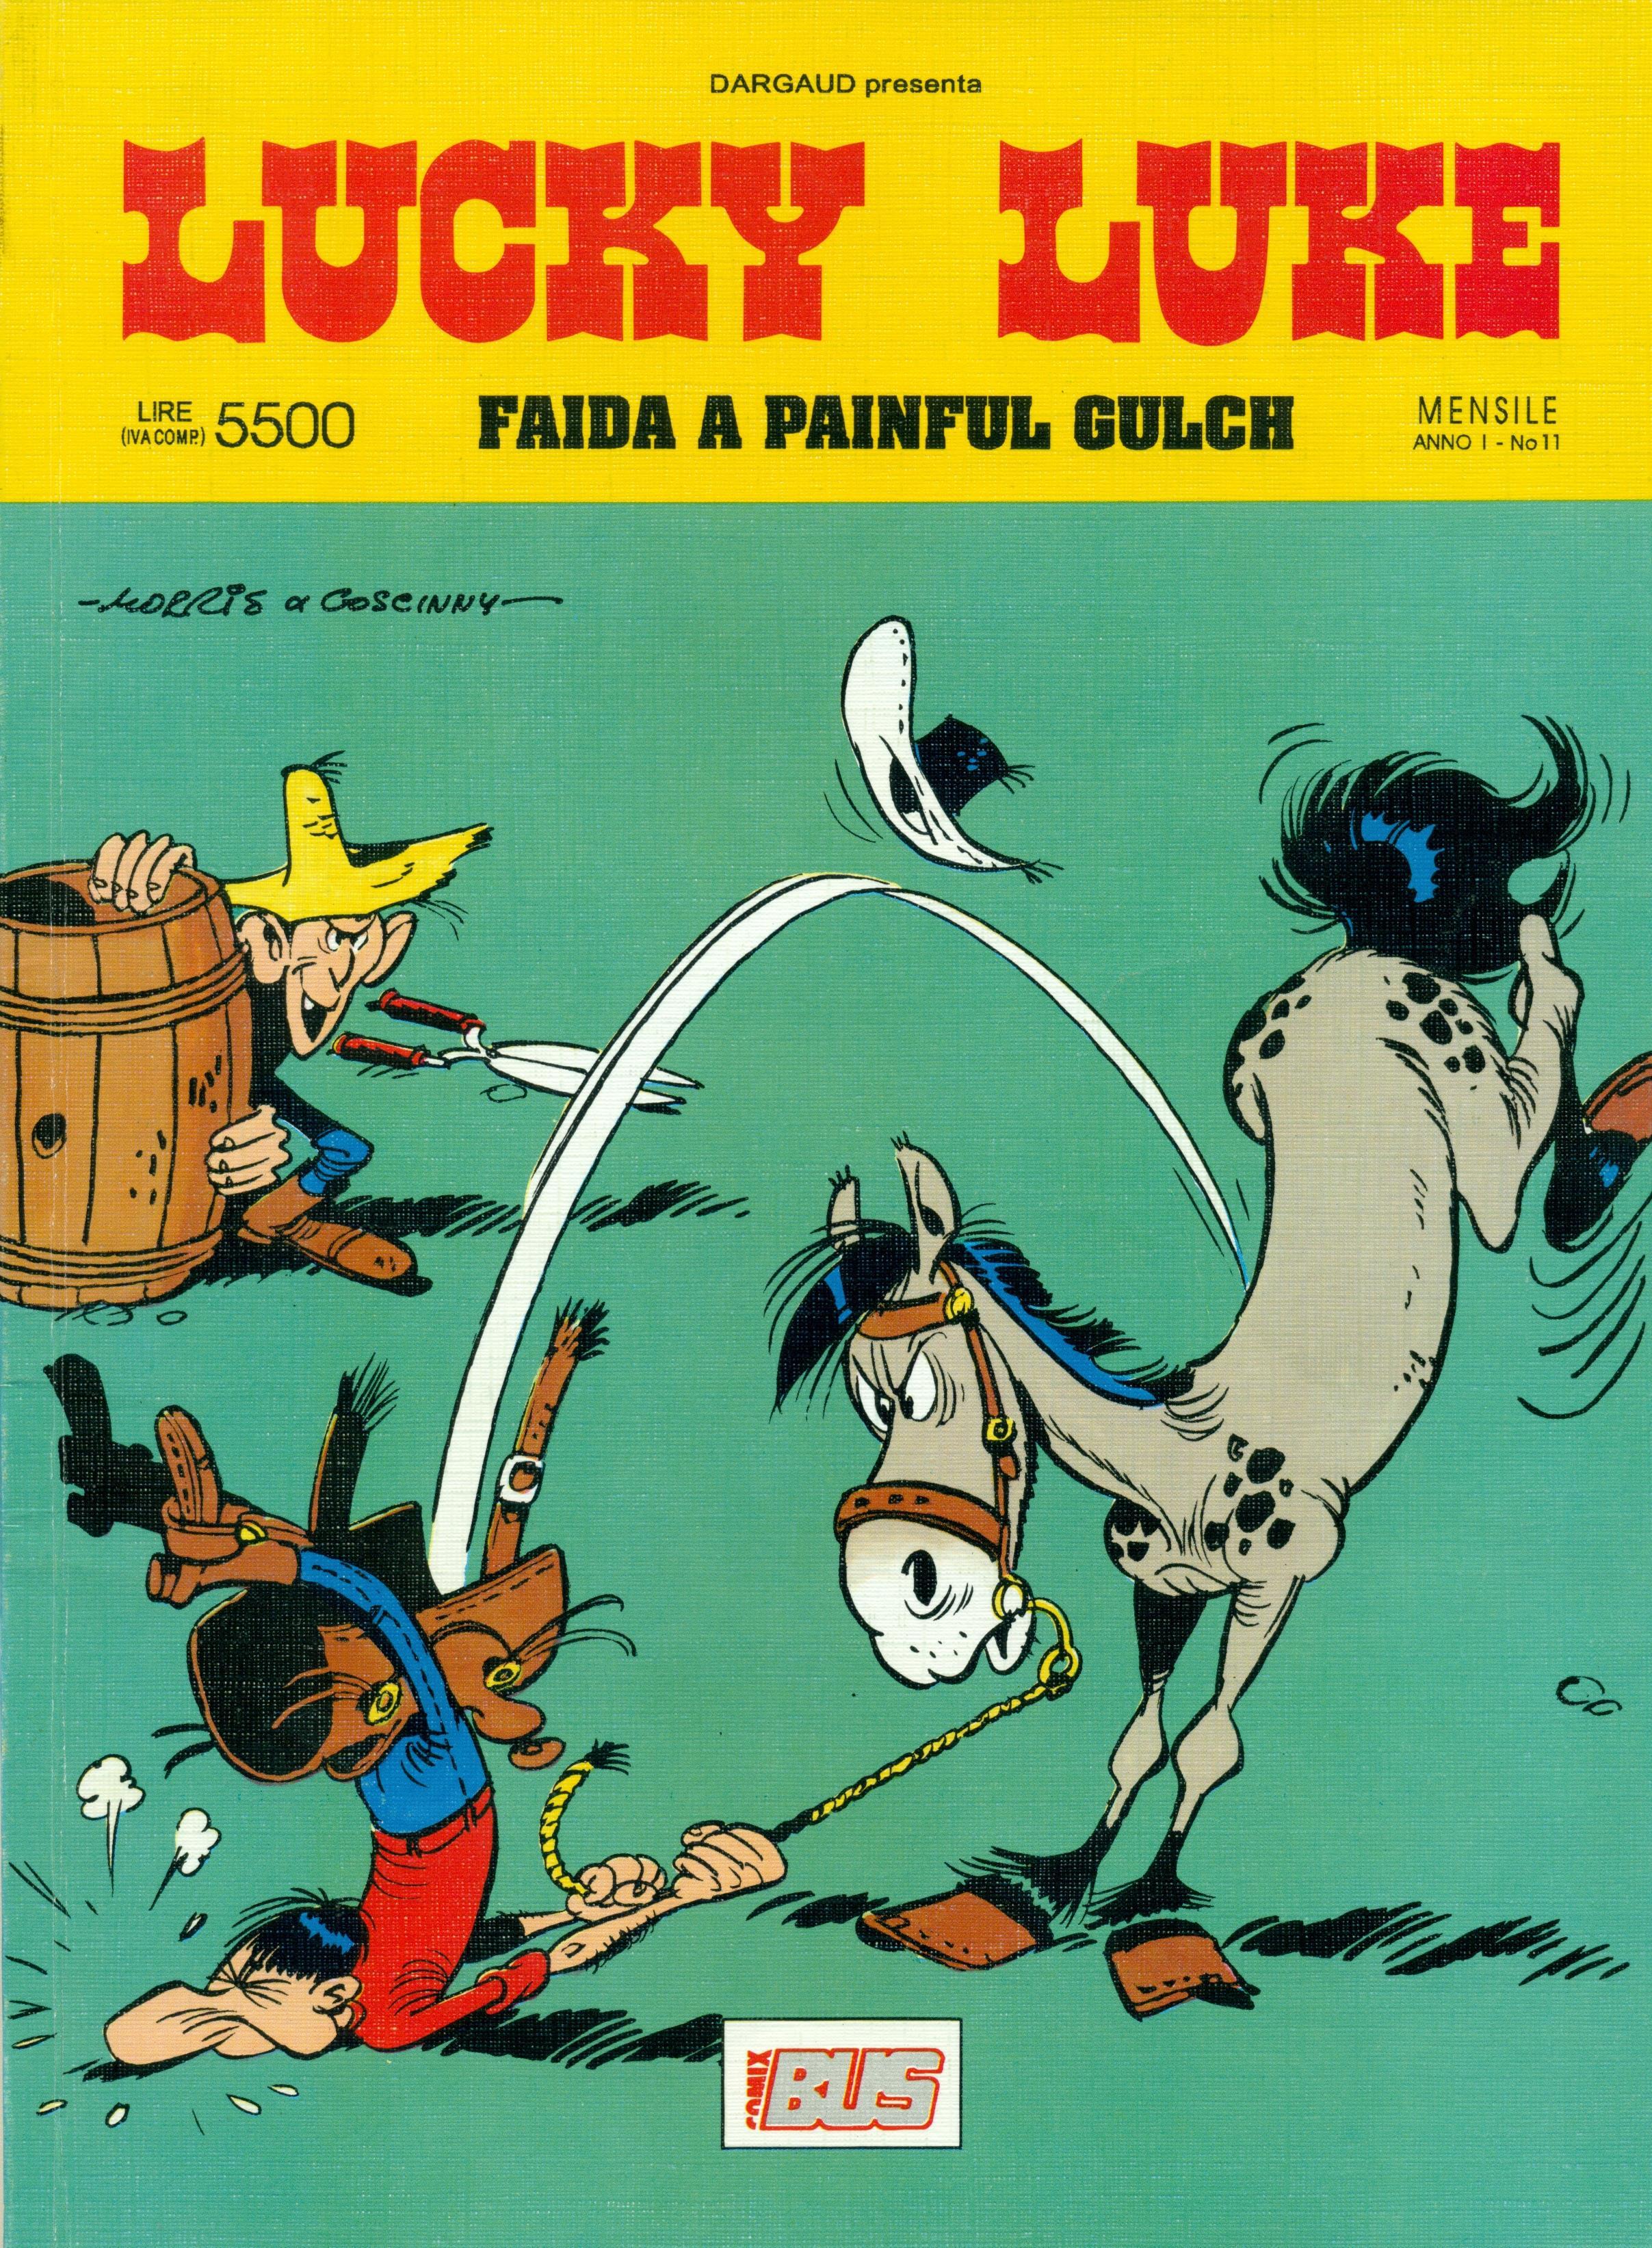 Lucky Luke - Faida a Painful Gulch